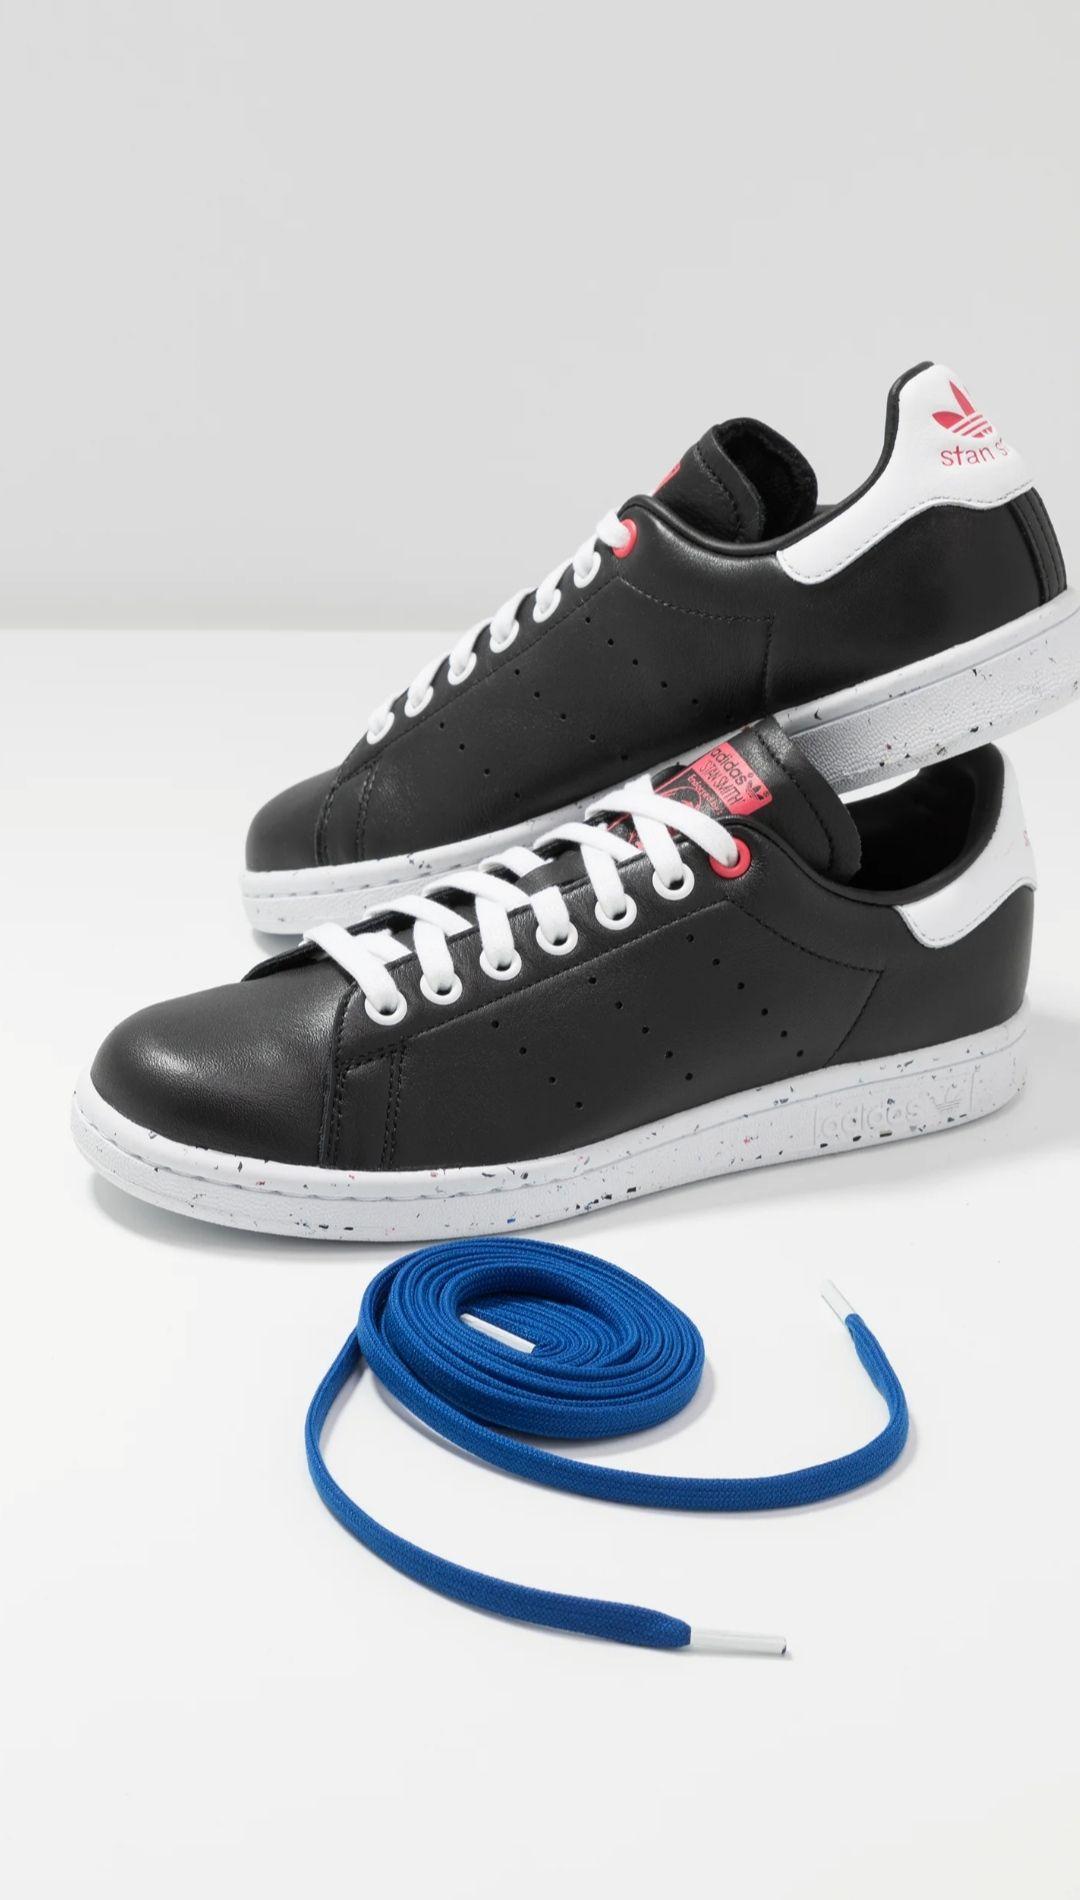 Chaussures Adidas Stan Smith - CoreBlack/Royal Blue/FootWear White